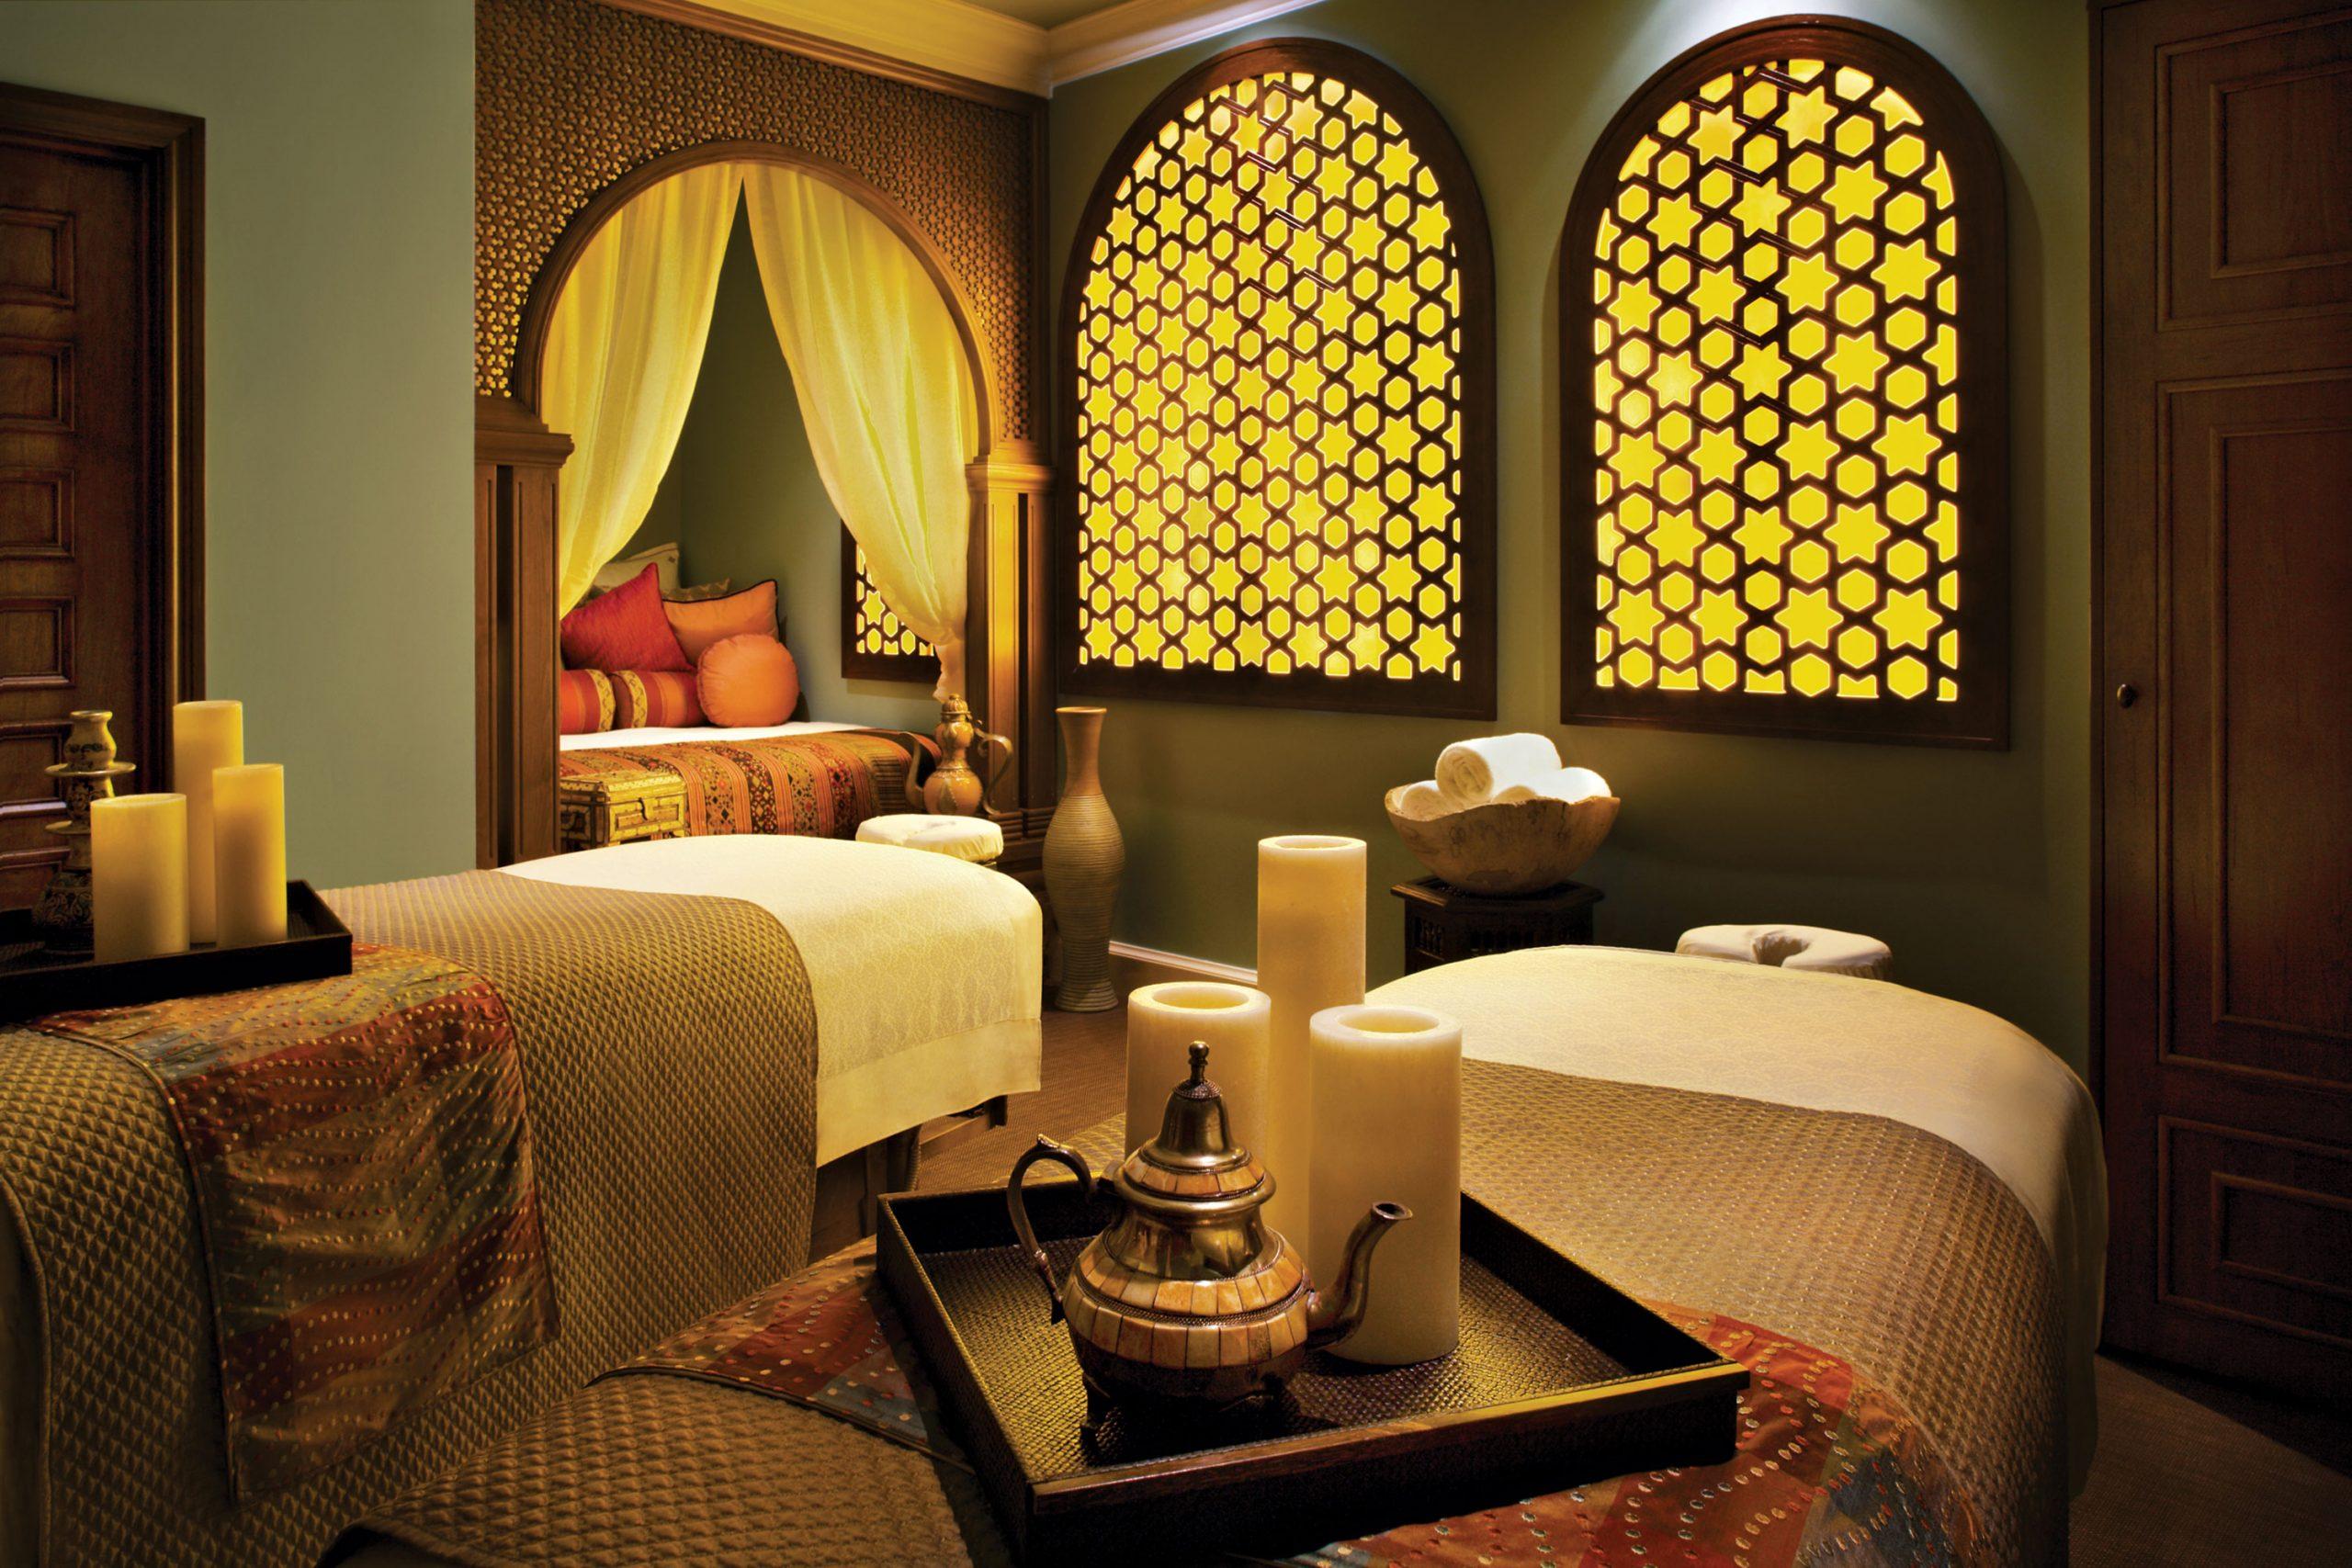 Joya Spa suite at Omni Scottsdale Resort & Spa at Montelucia; Photo courtesy Omni Scottsdale Resort & Spa at Montelucia